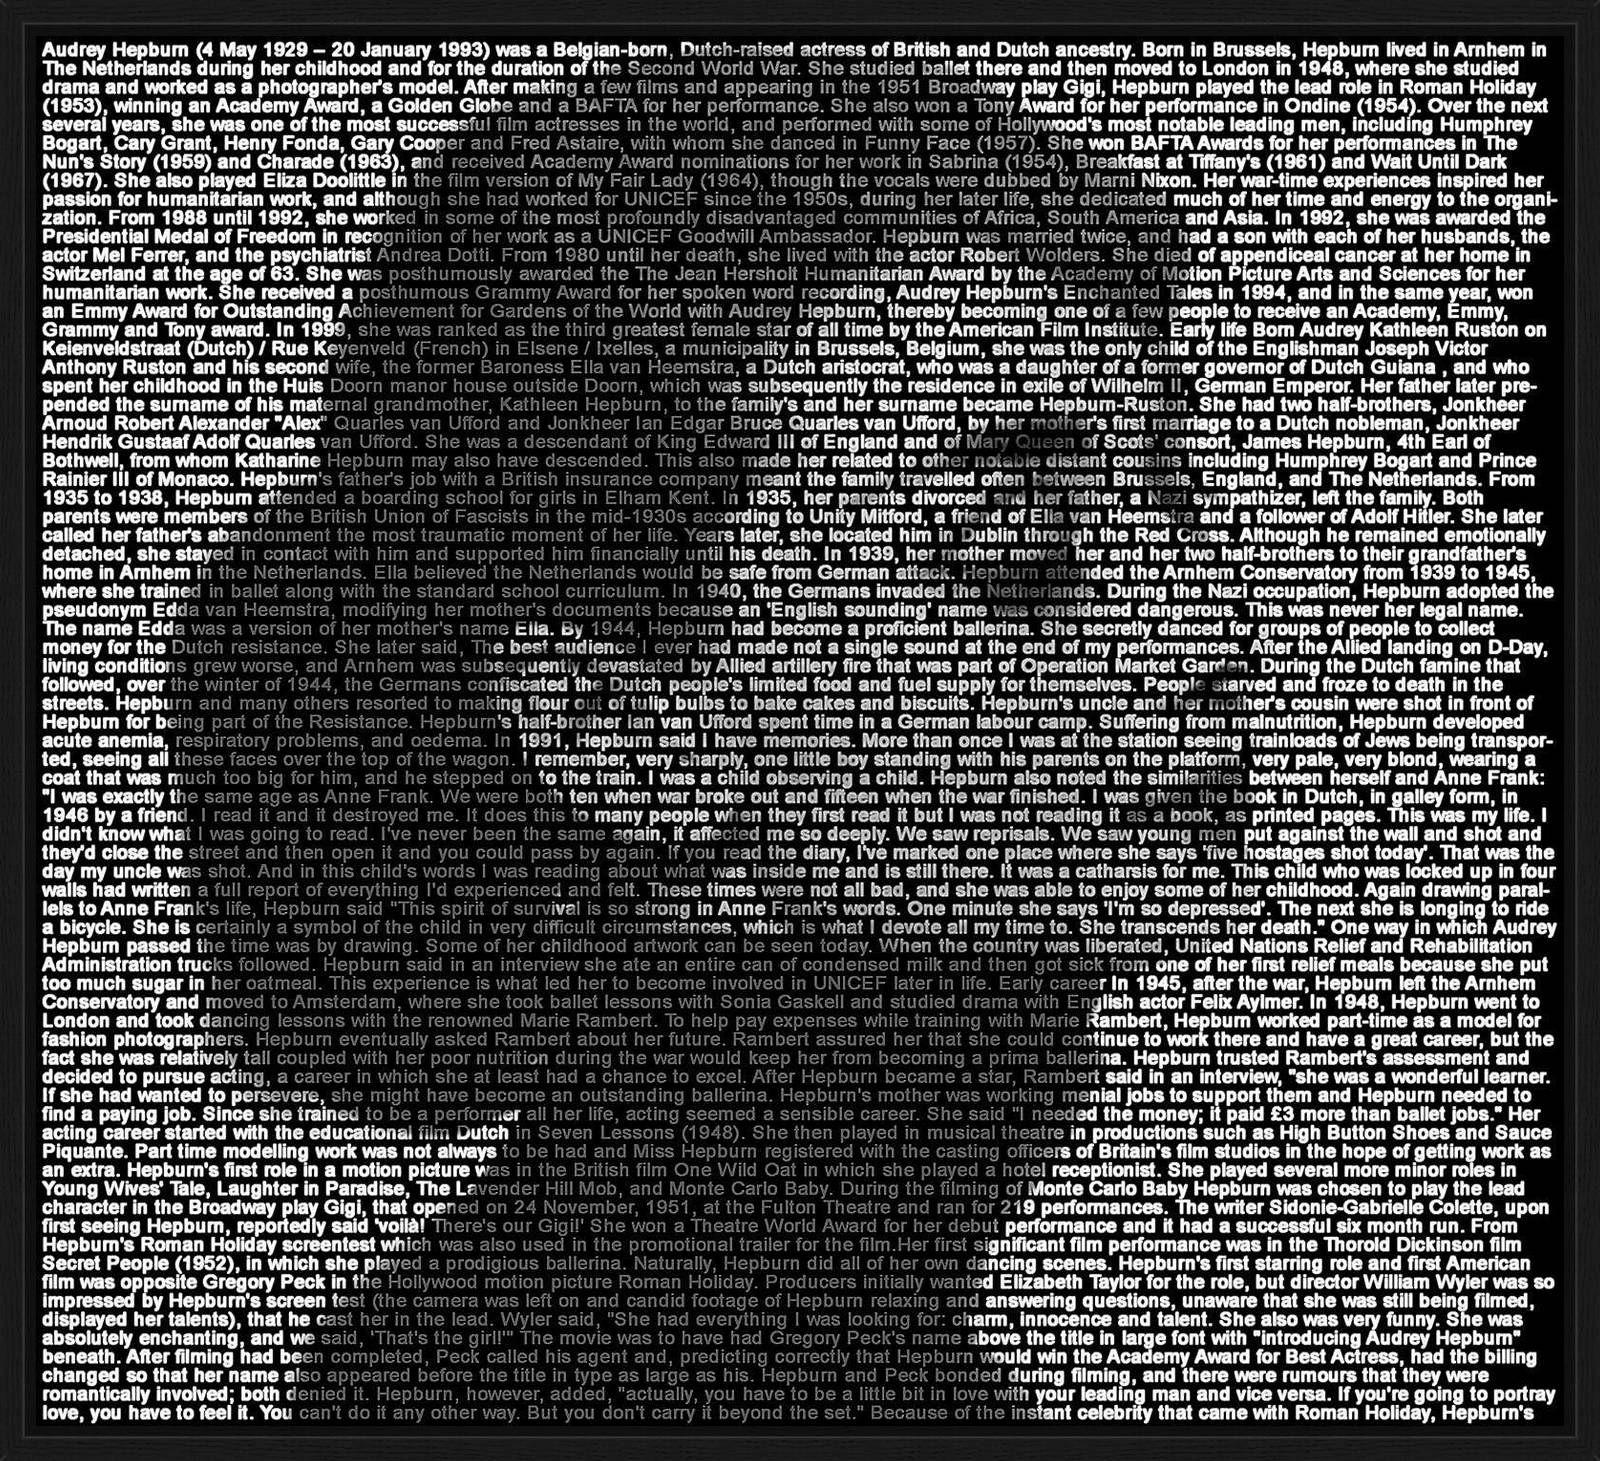 Audrey Hepburn III - Ralph Ueltzhoeffer - pictures, photography, photo art online at LUMAS